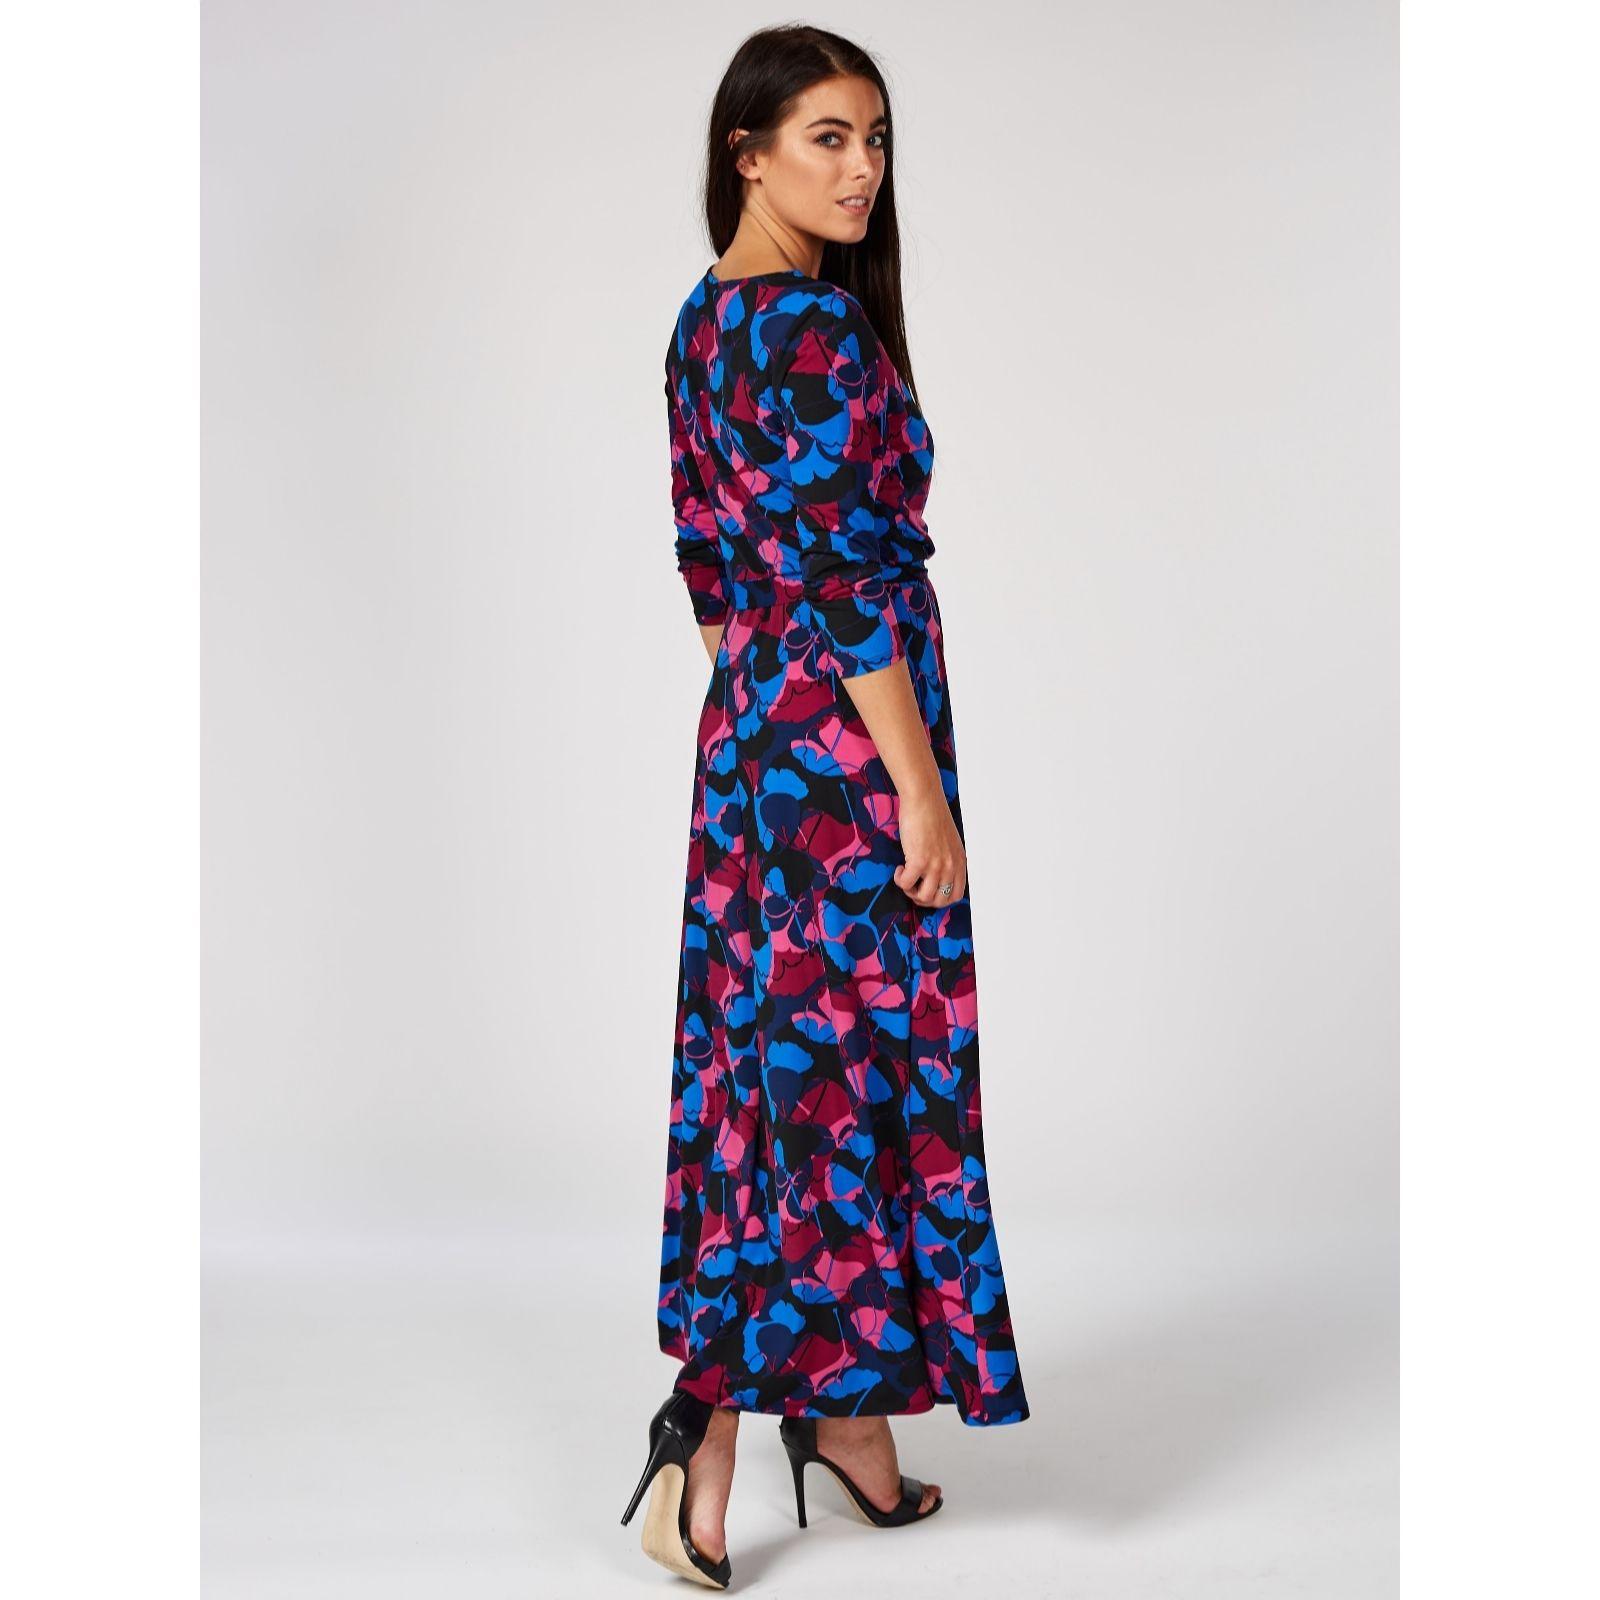 da9ba177a20 Du Jour Printed Faux Wrap Maxi Dress Petite - QVC UK